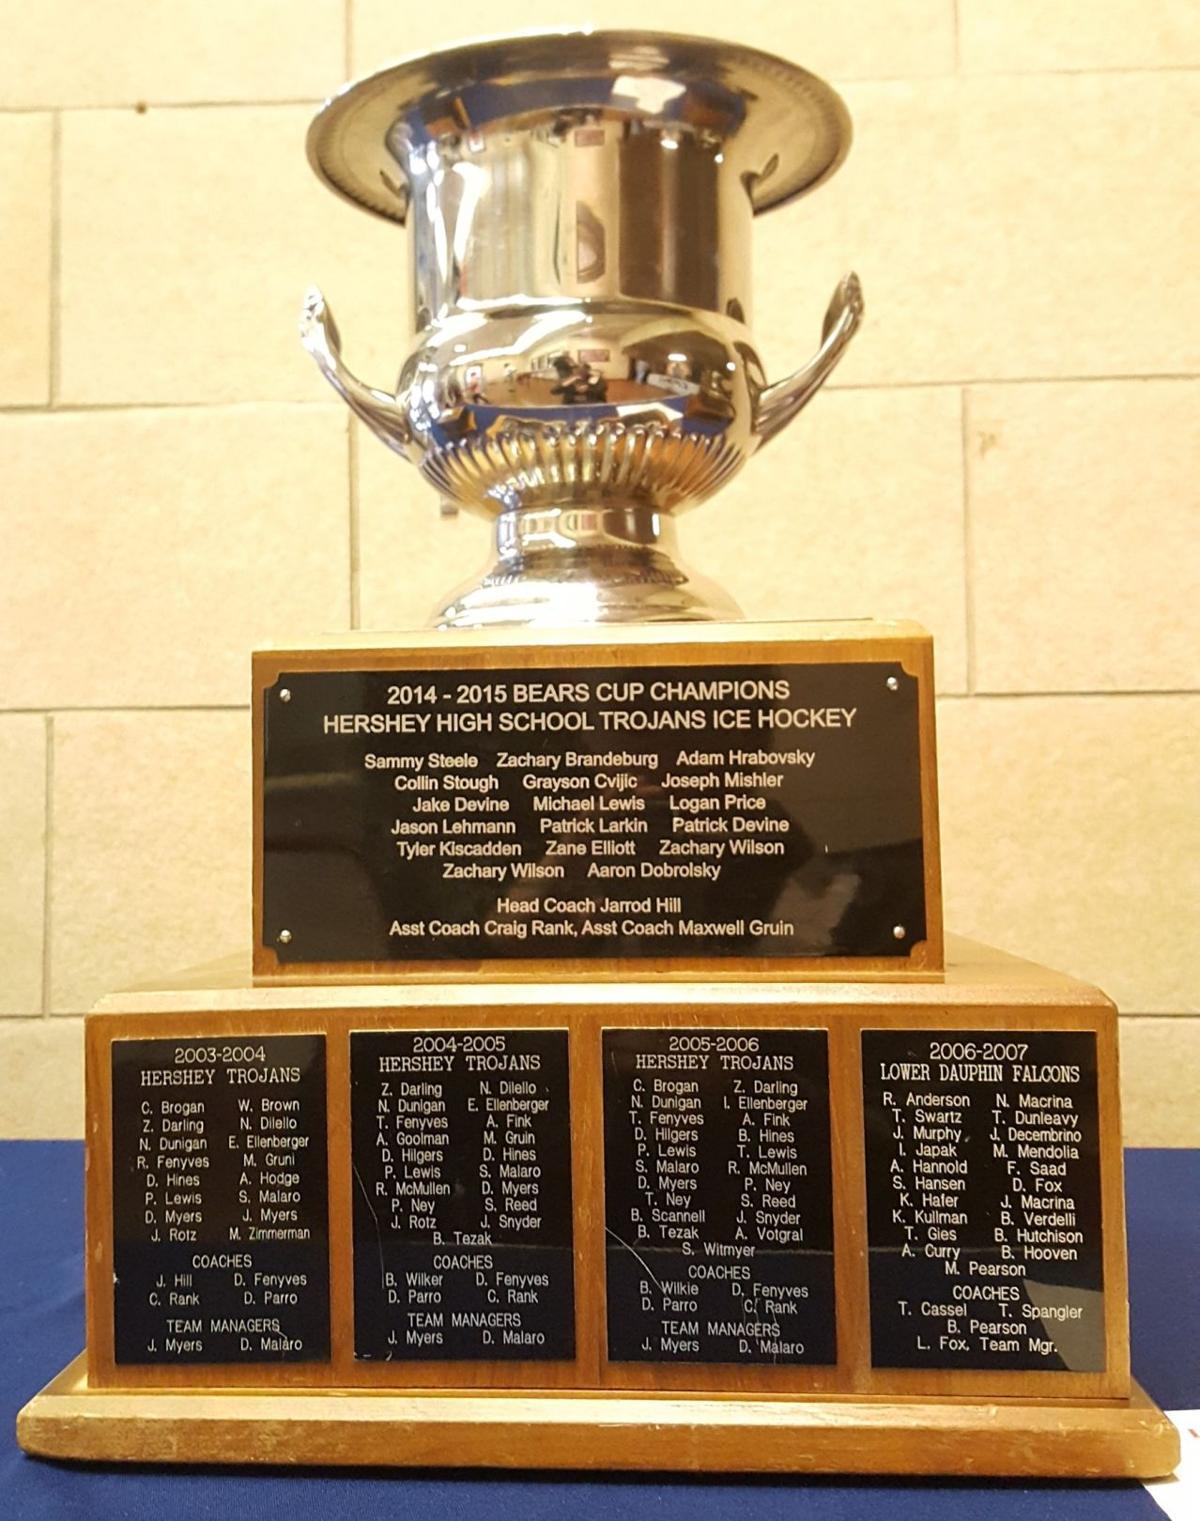 CPIHL's Bears Cup